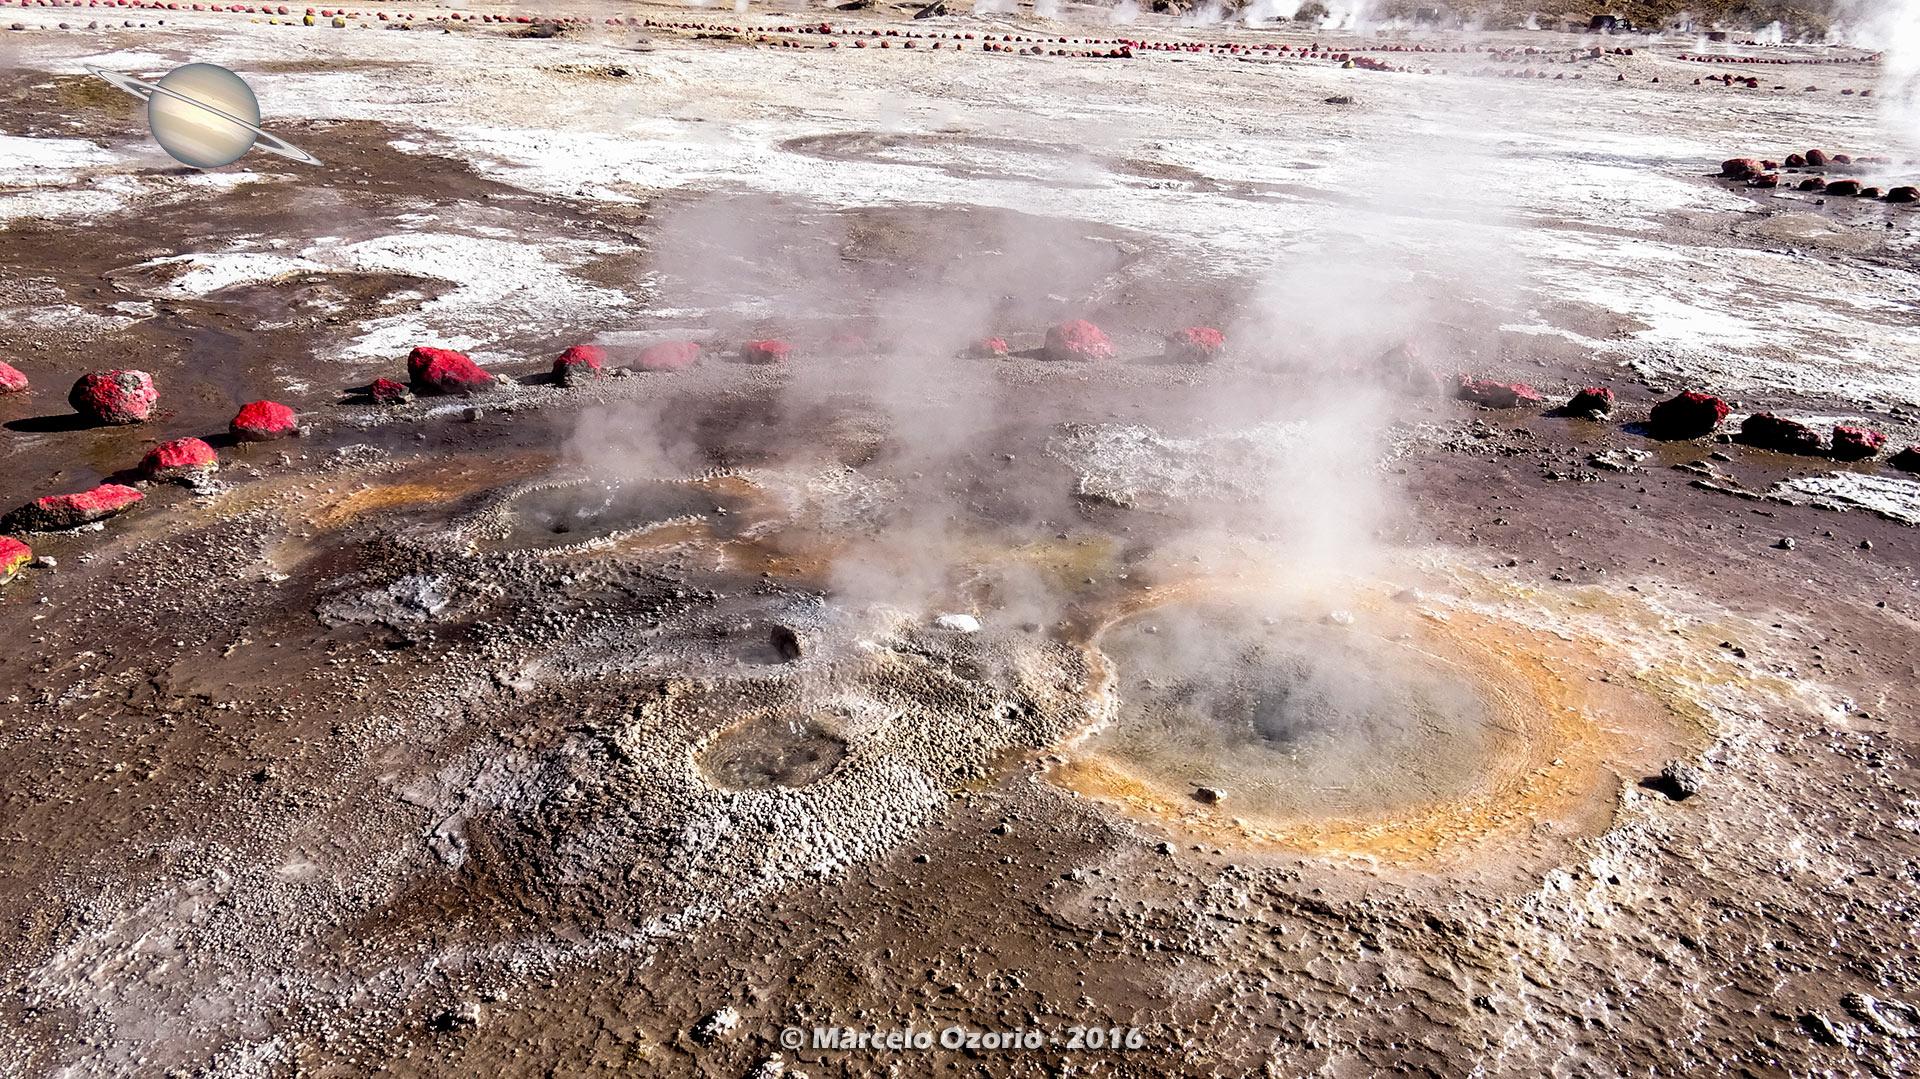 el tatio geysers atacama desert 36 - Os Surreais Gêiseres El Tatio - Deserto do Atacama - Chile